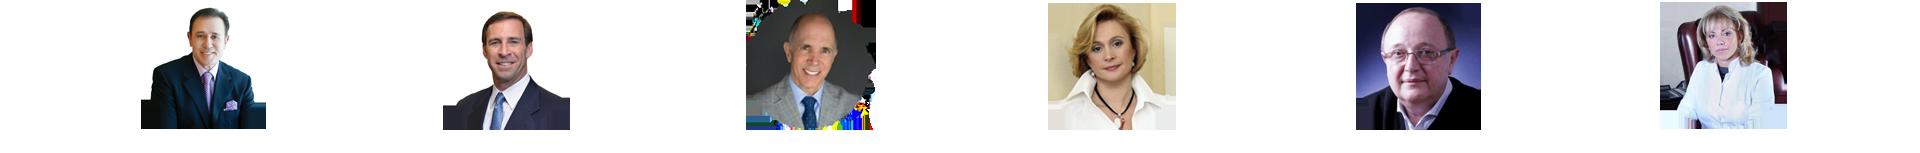 plashka docs - Отзывы о технологии HydraFacial®